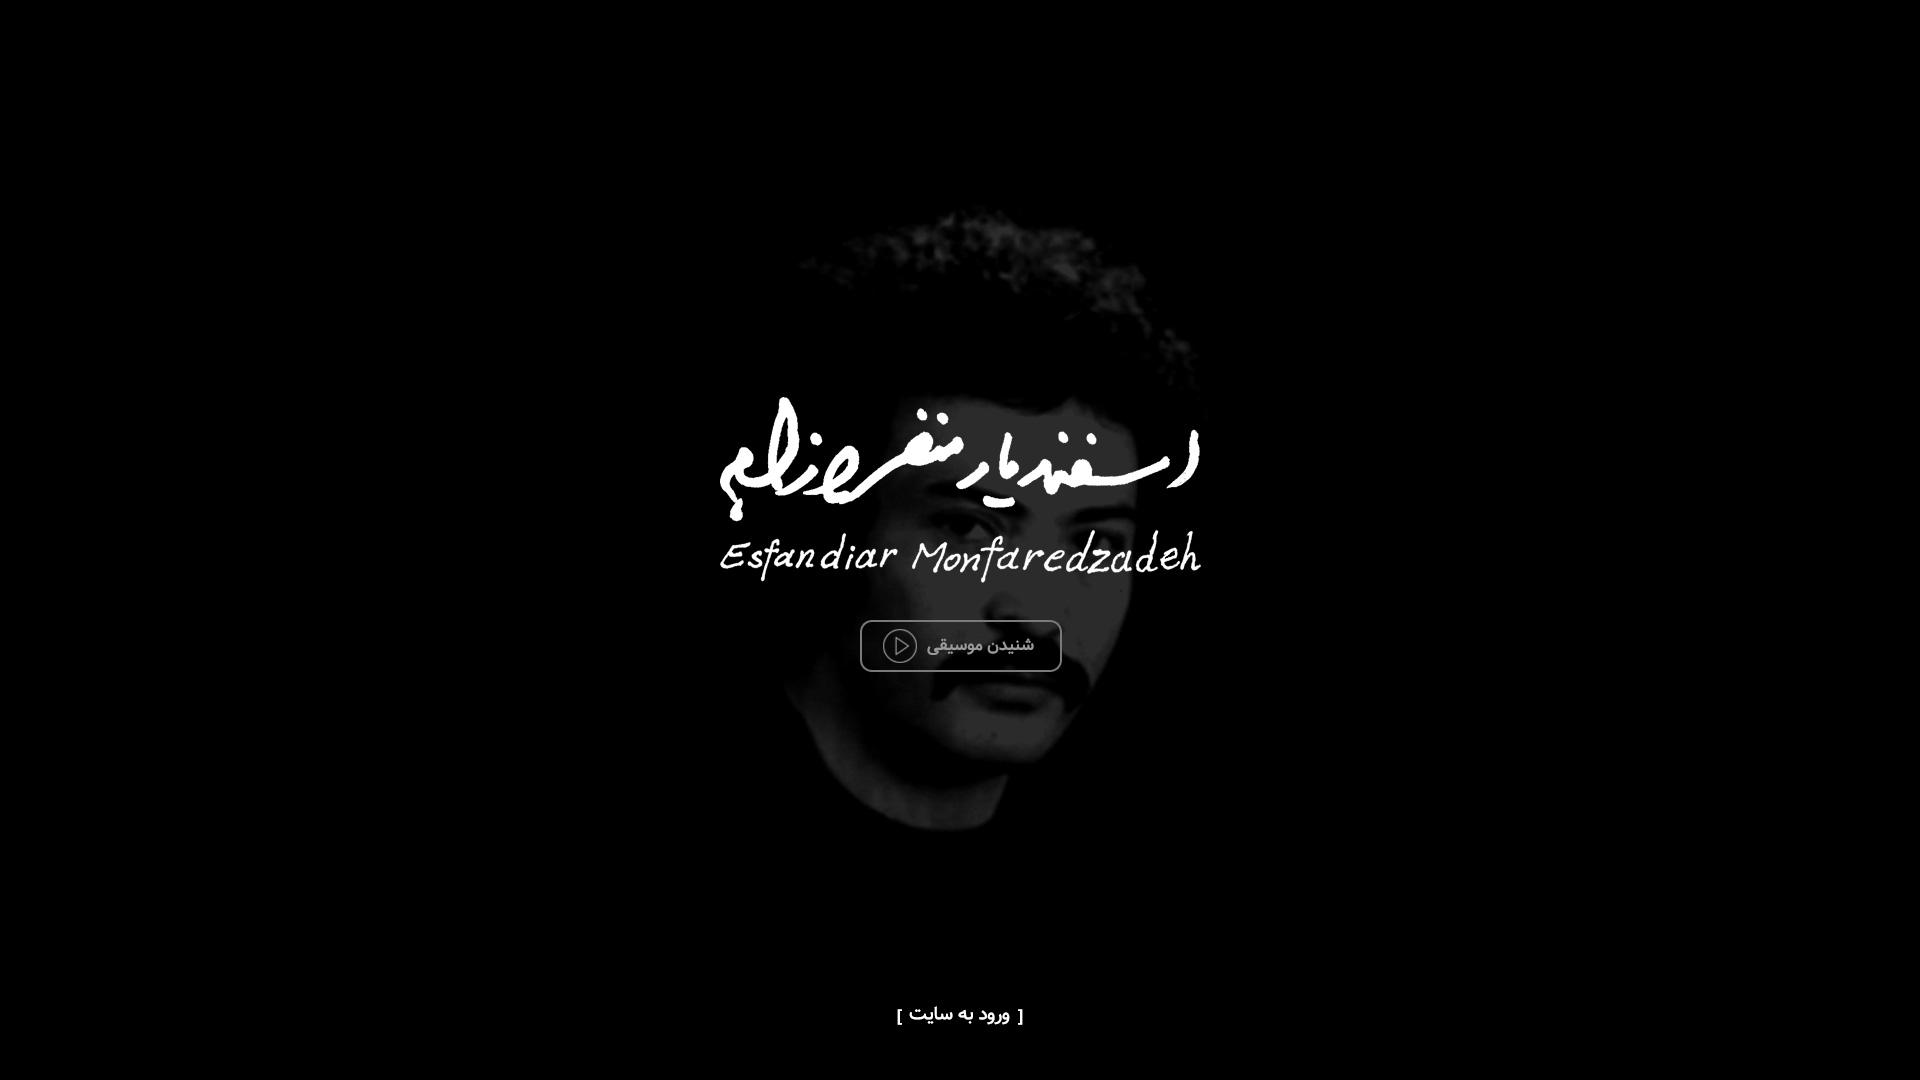 Esfandiar-Monfaredzadeh-Official-Website